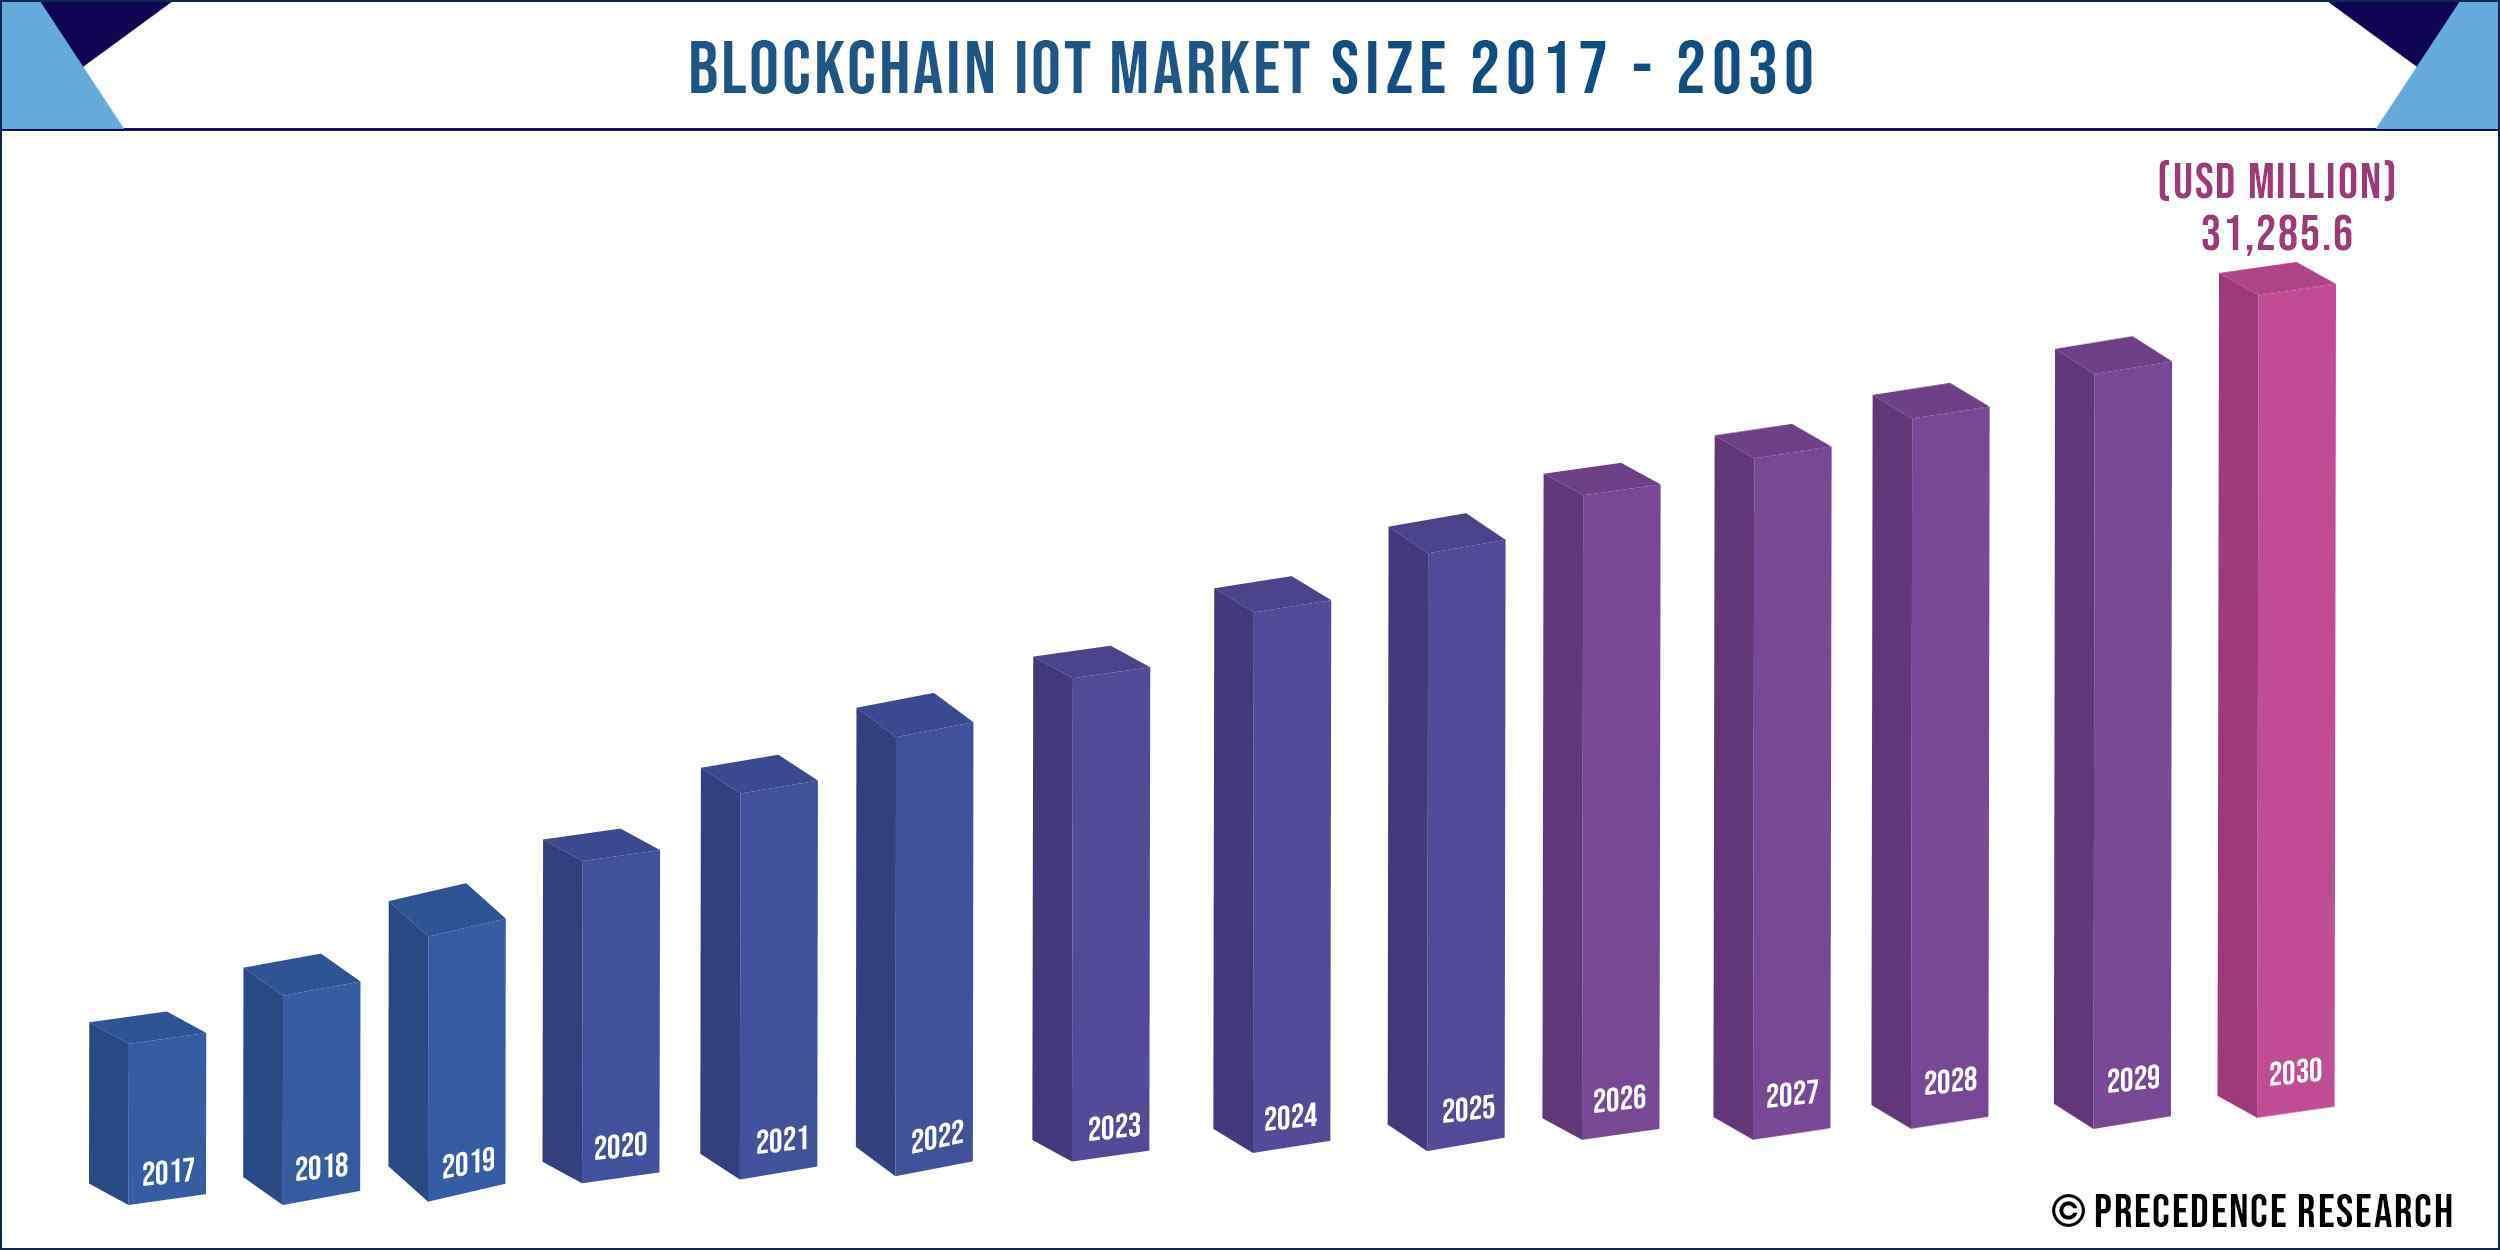 Blockchain IoT Market Size 2017 to 2030